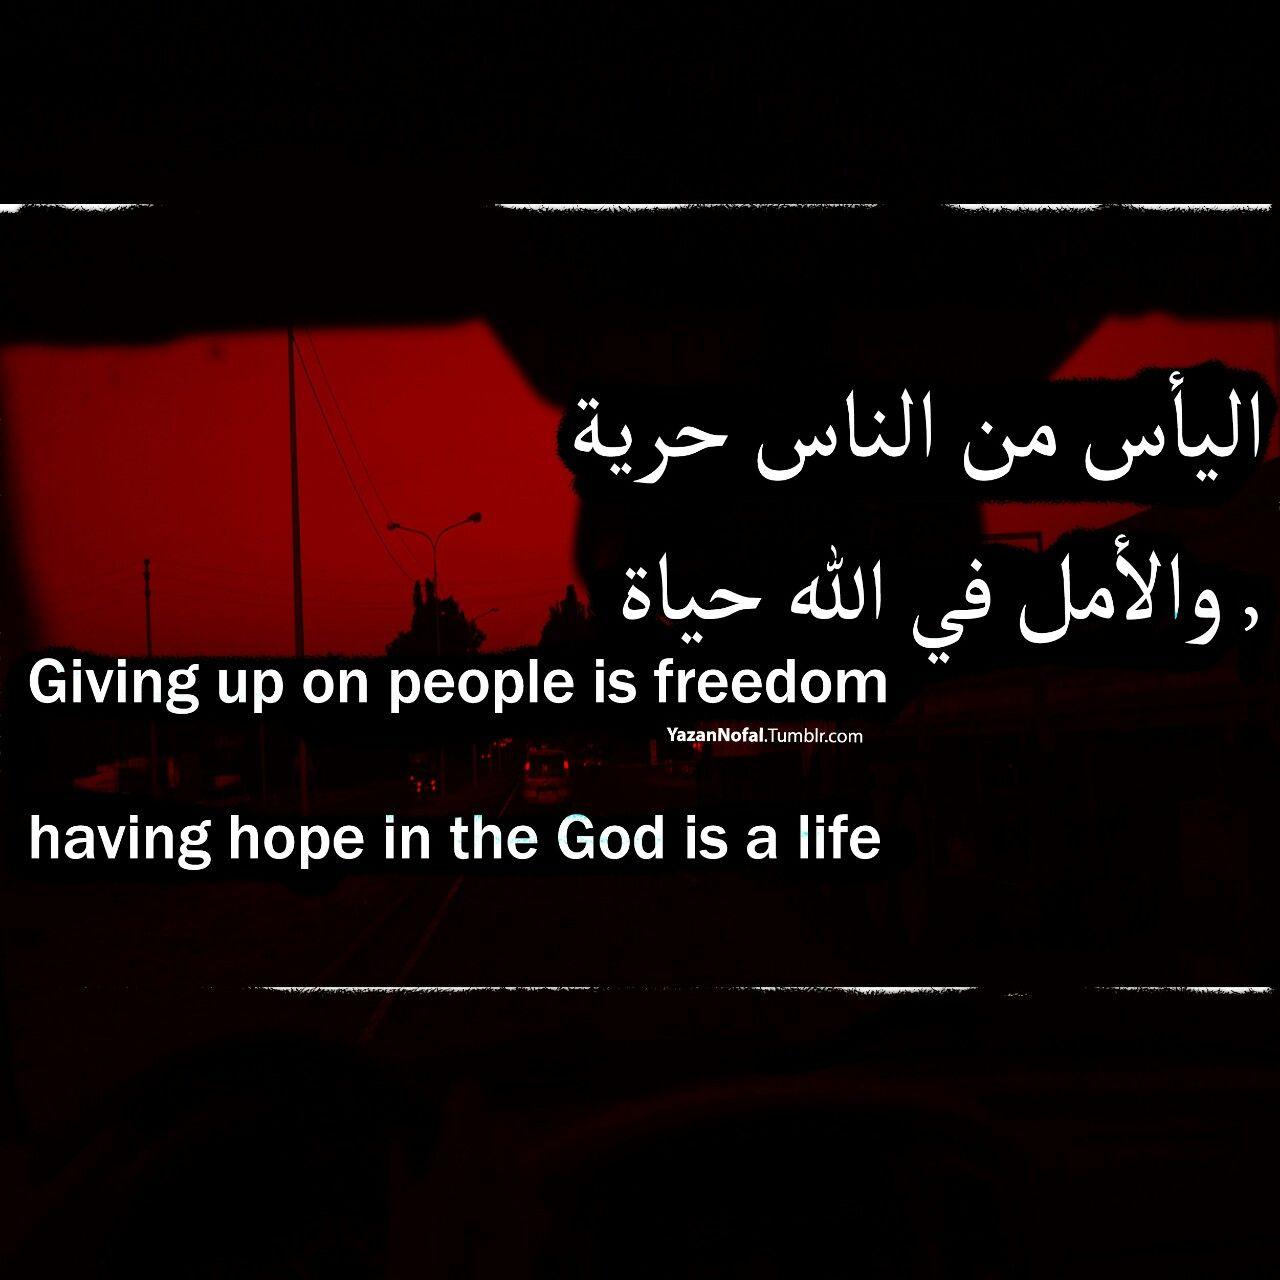 Yazan Nofal اليأس من الناس ح رية والأمل في الل ه حياة Life Giving Up Freedom